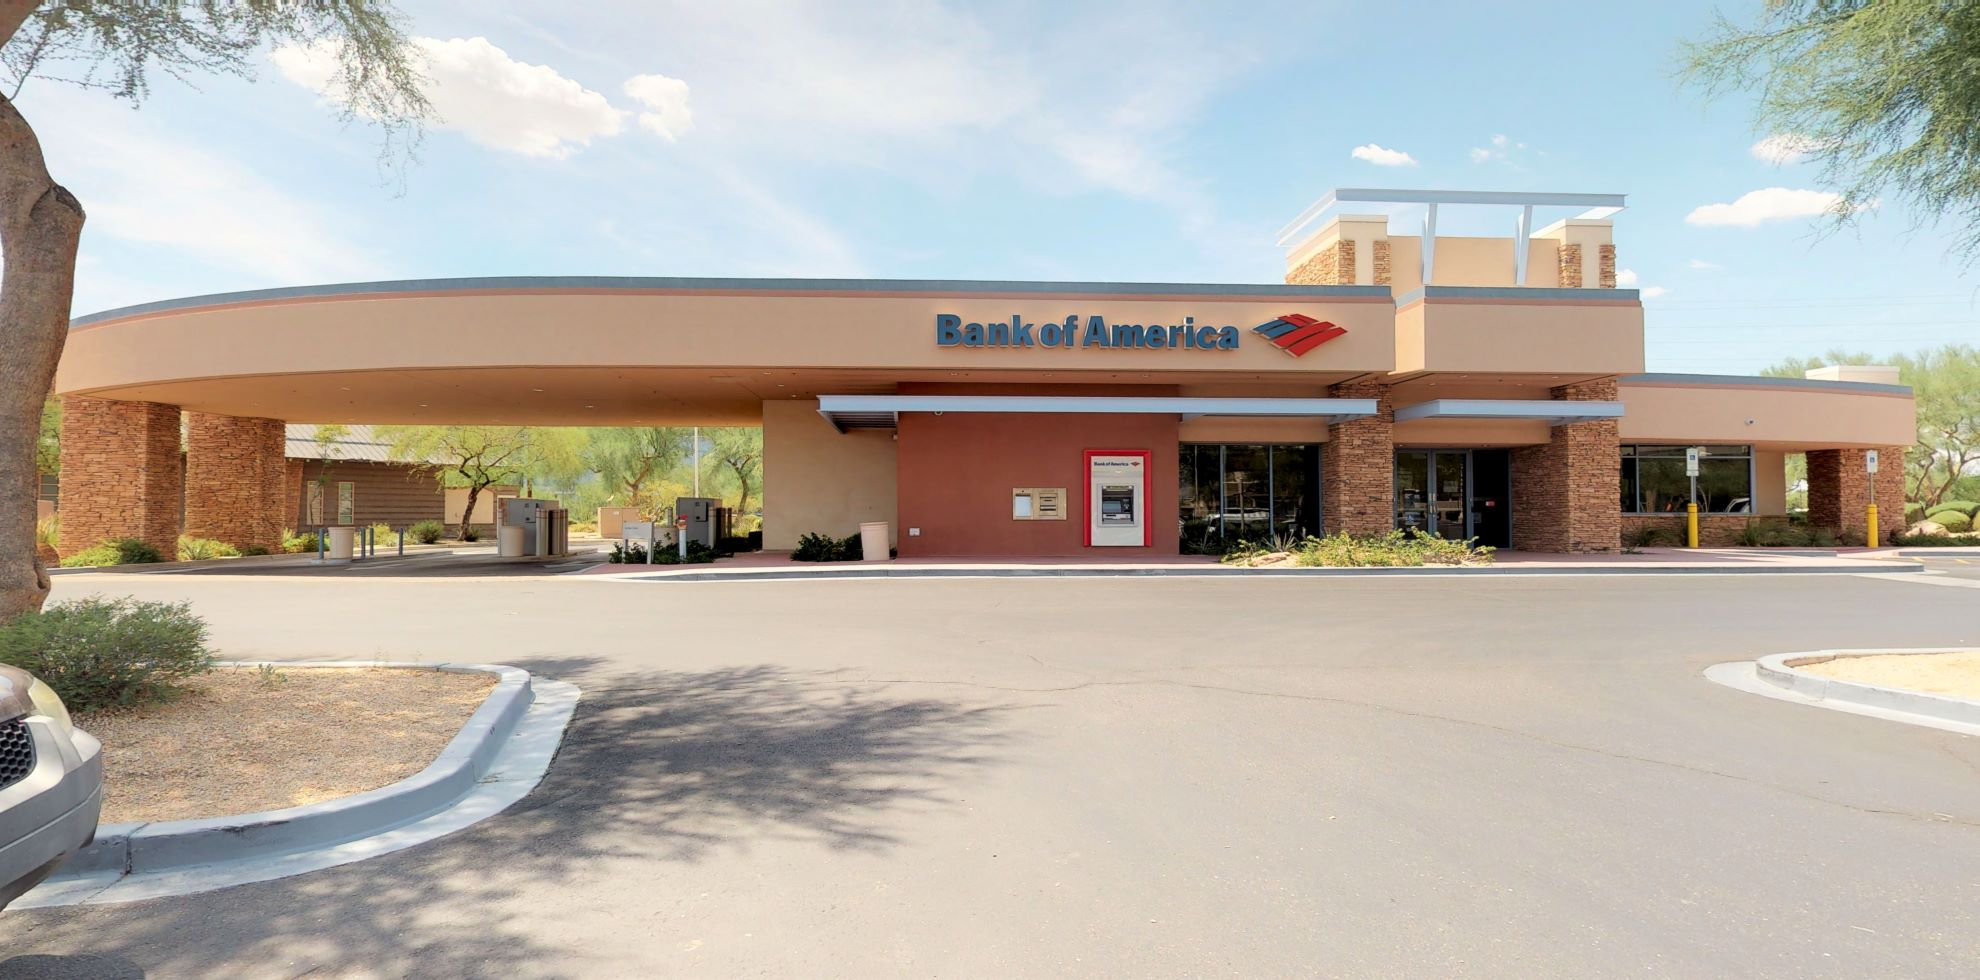 Bank of America financial center with drive-thru ATM   16431 N Scottsdale Rd, Scottsdale, AZ 85254